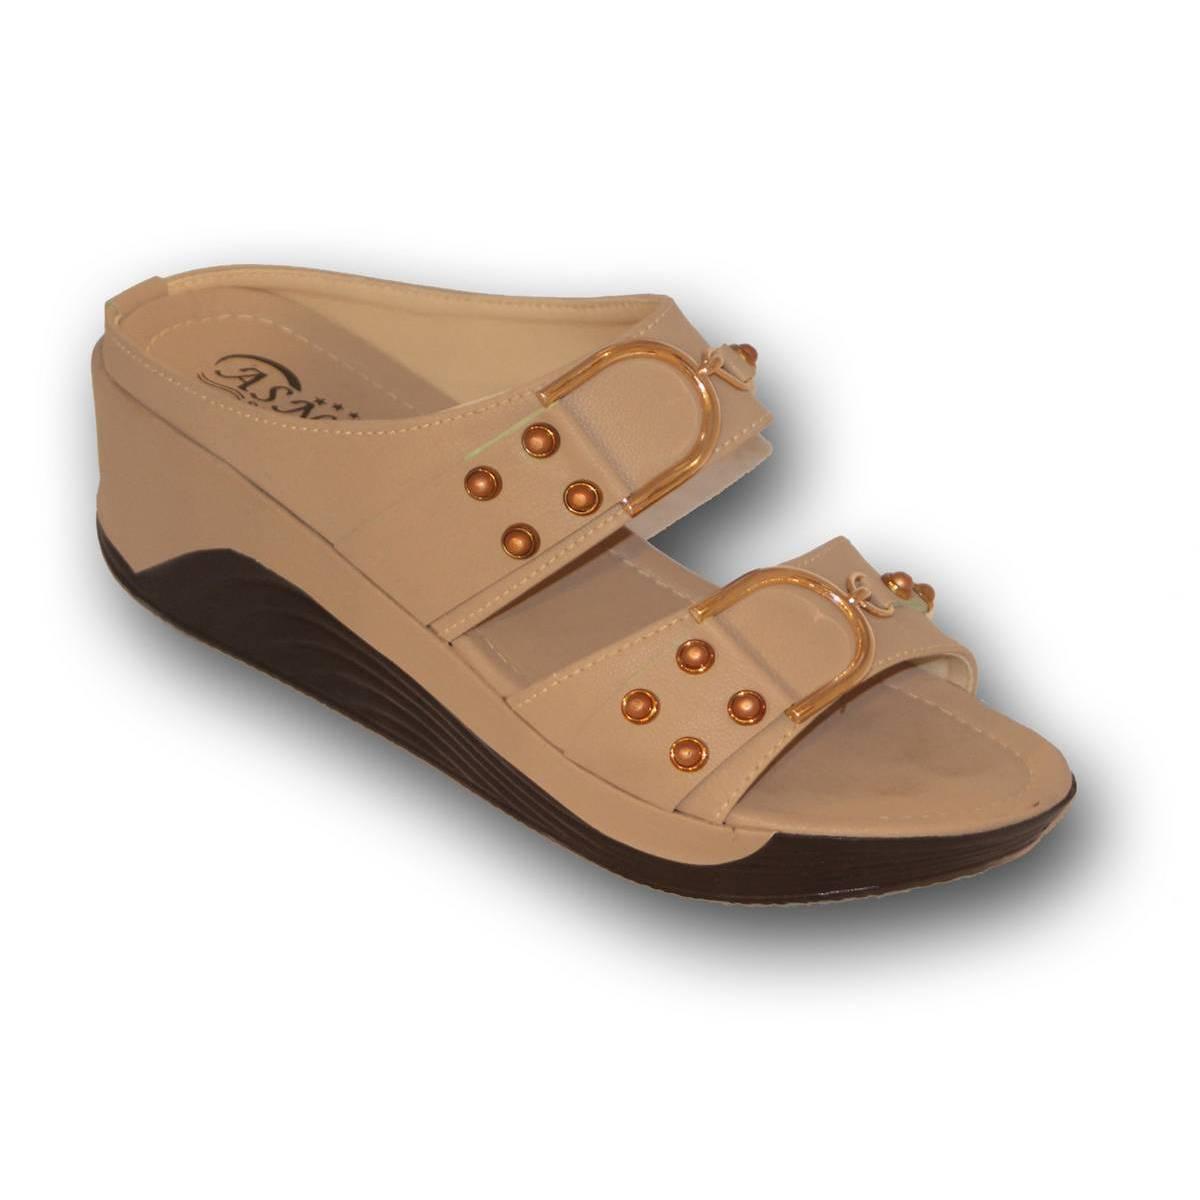 Every Season New Women's Beige Fashion Flat Sandals For Women Comfortable Summer Sandals For Women Fashion Sandals